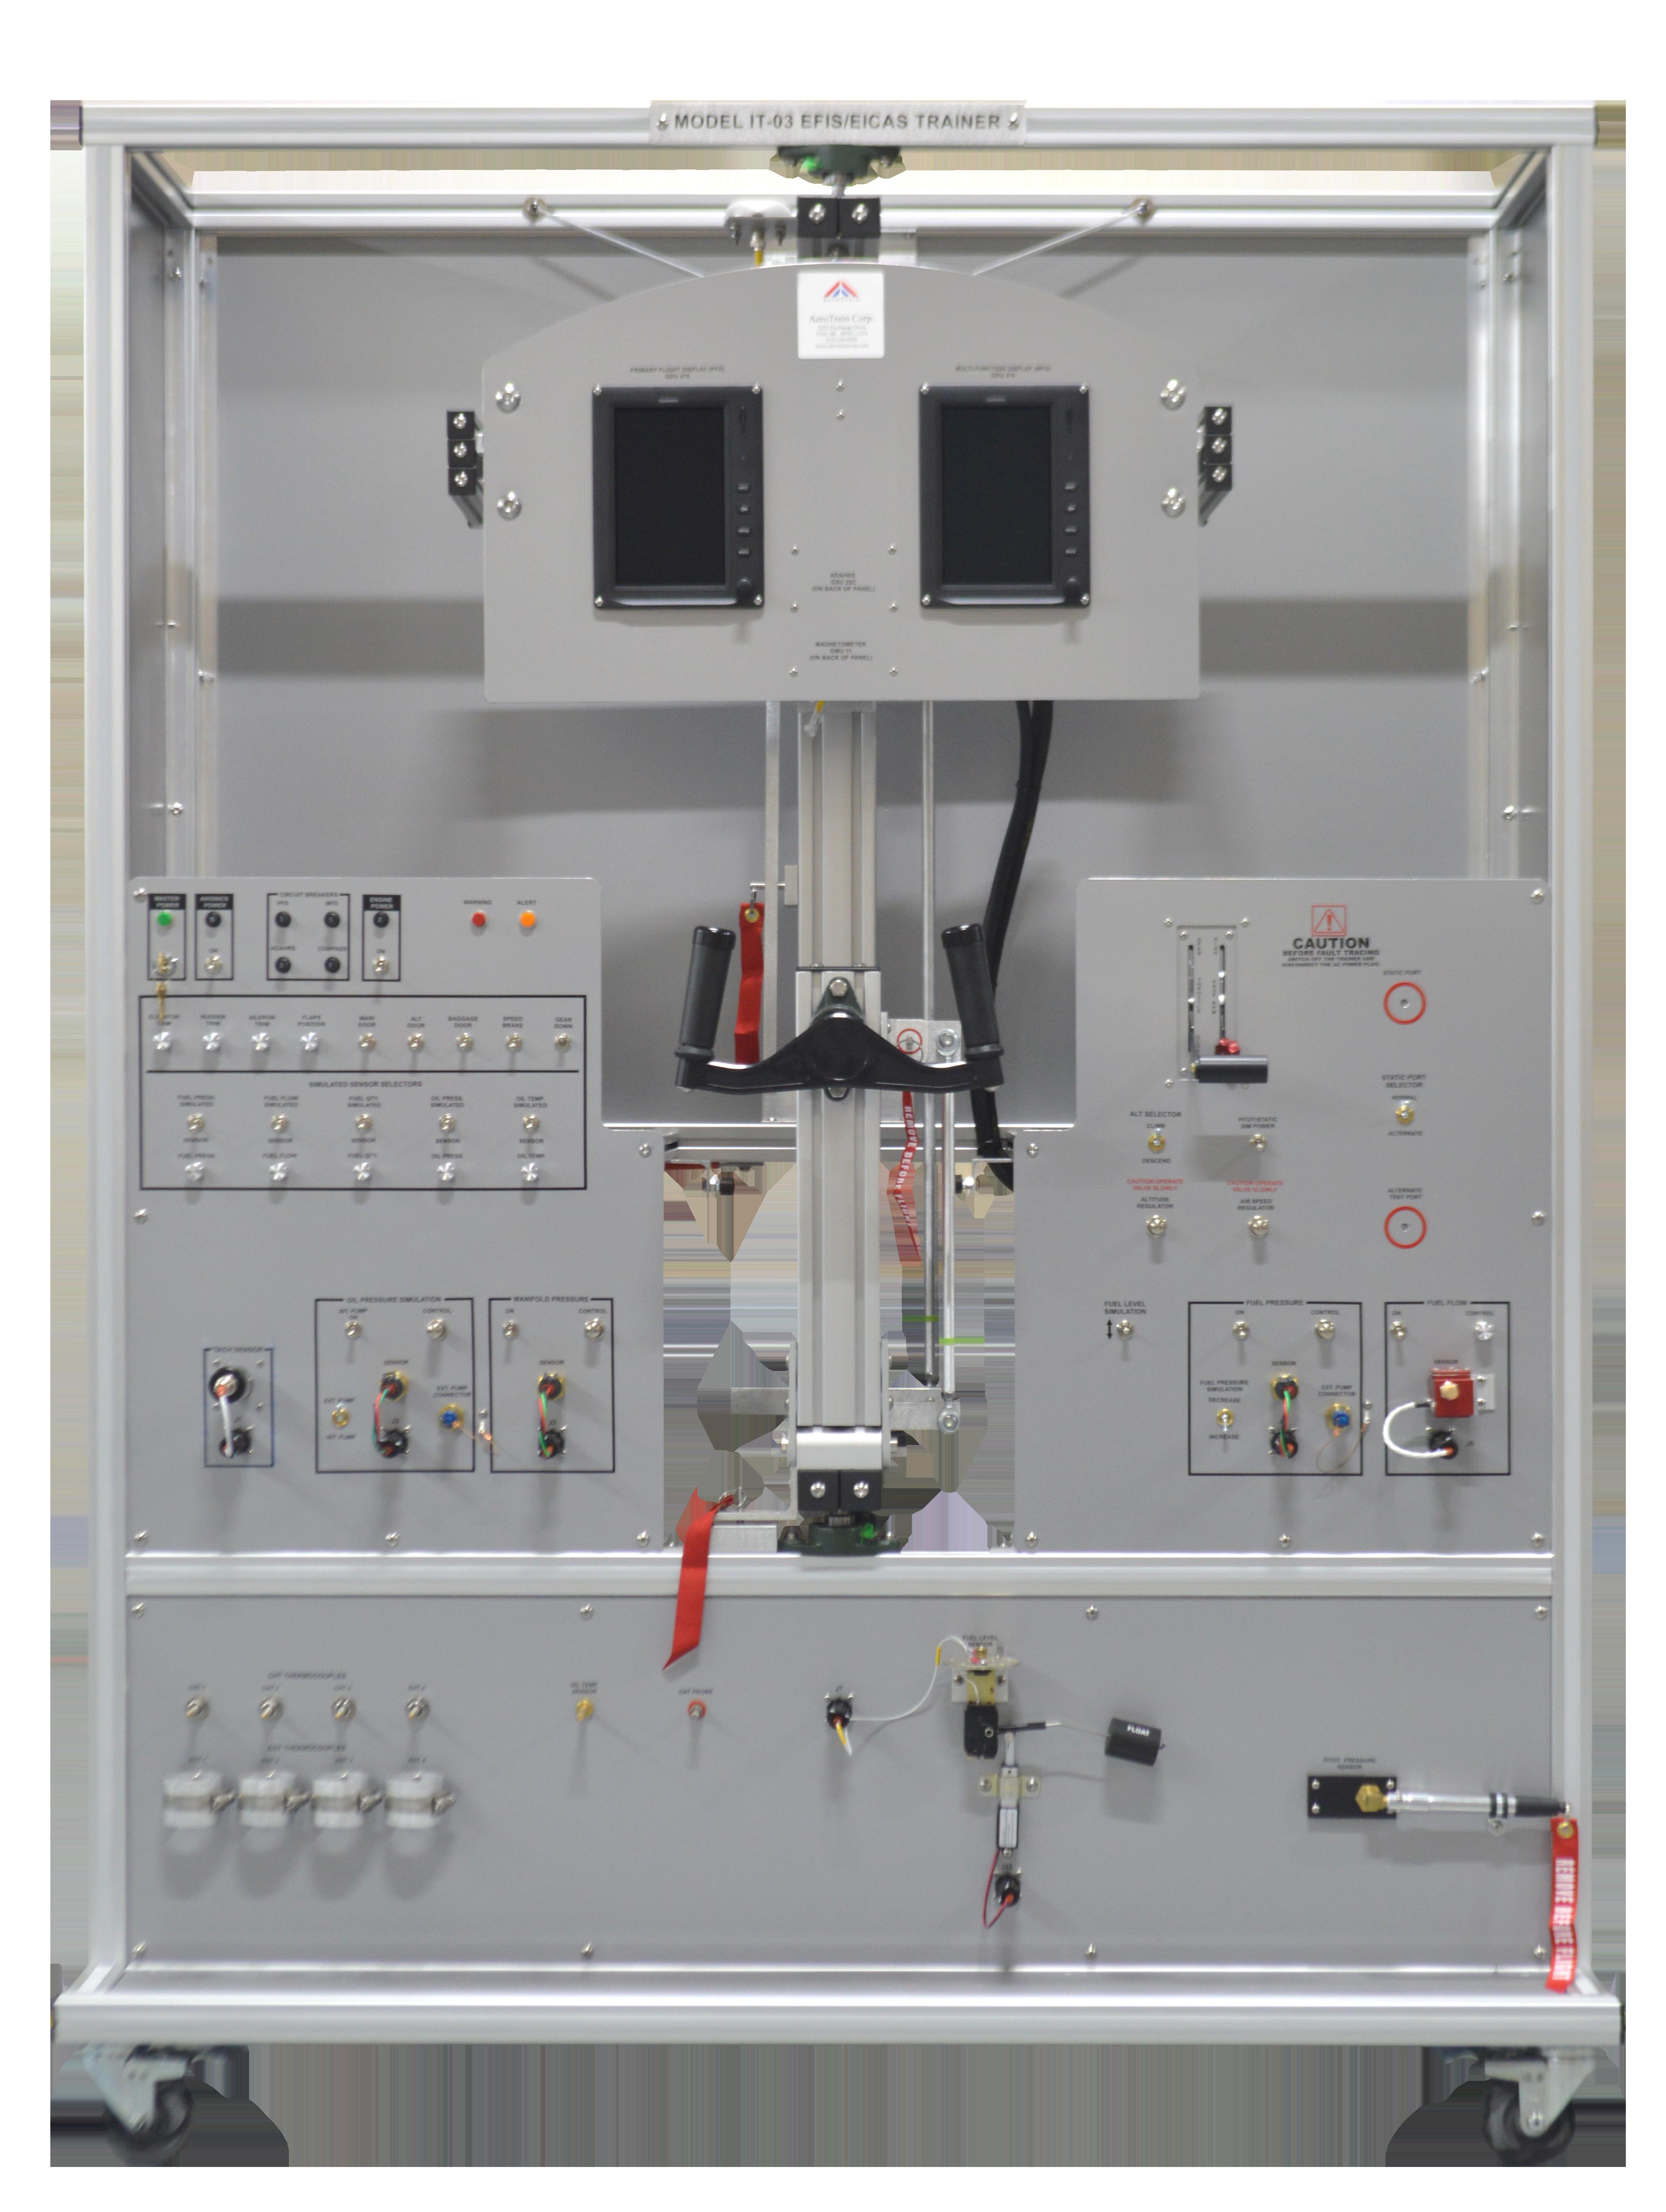 IT-03 EFIS/EICAS Trainer Model